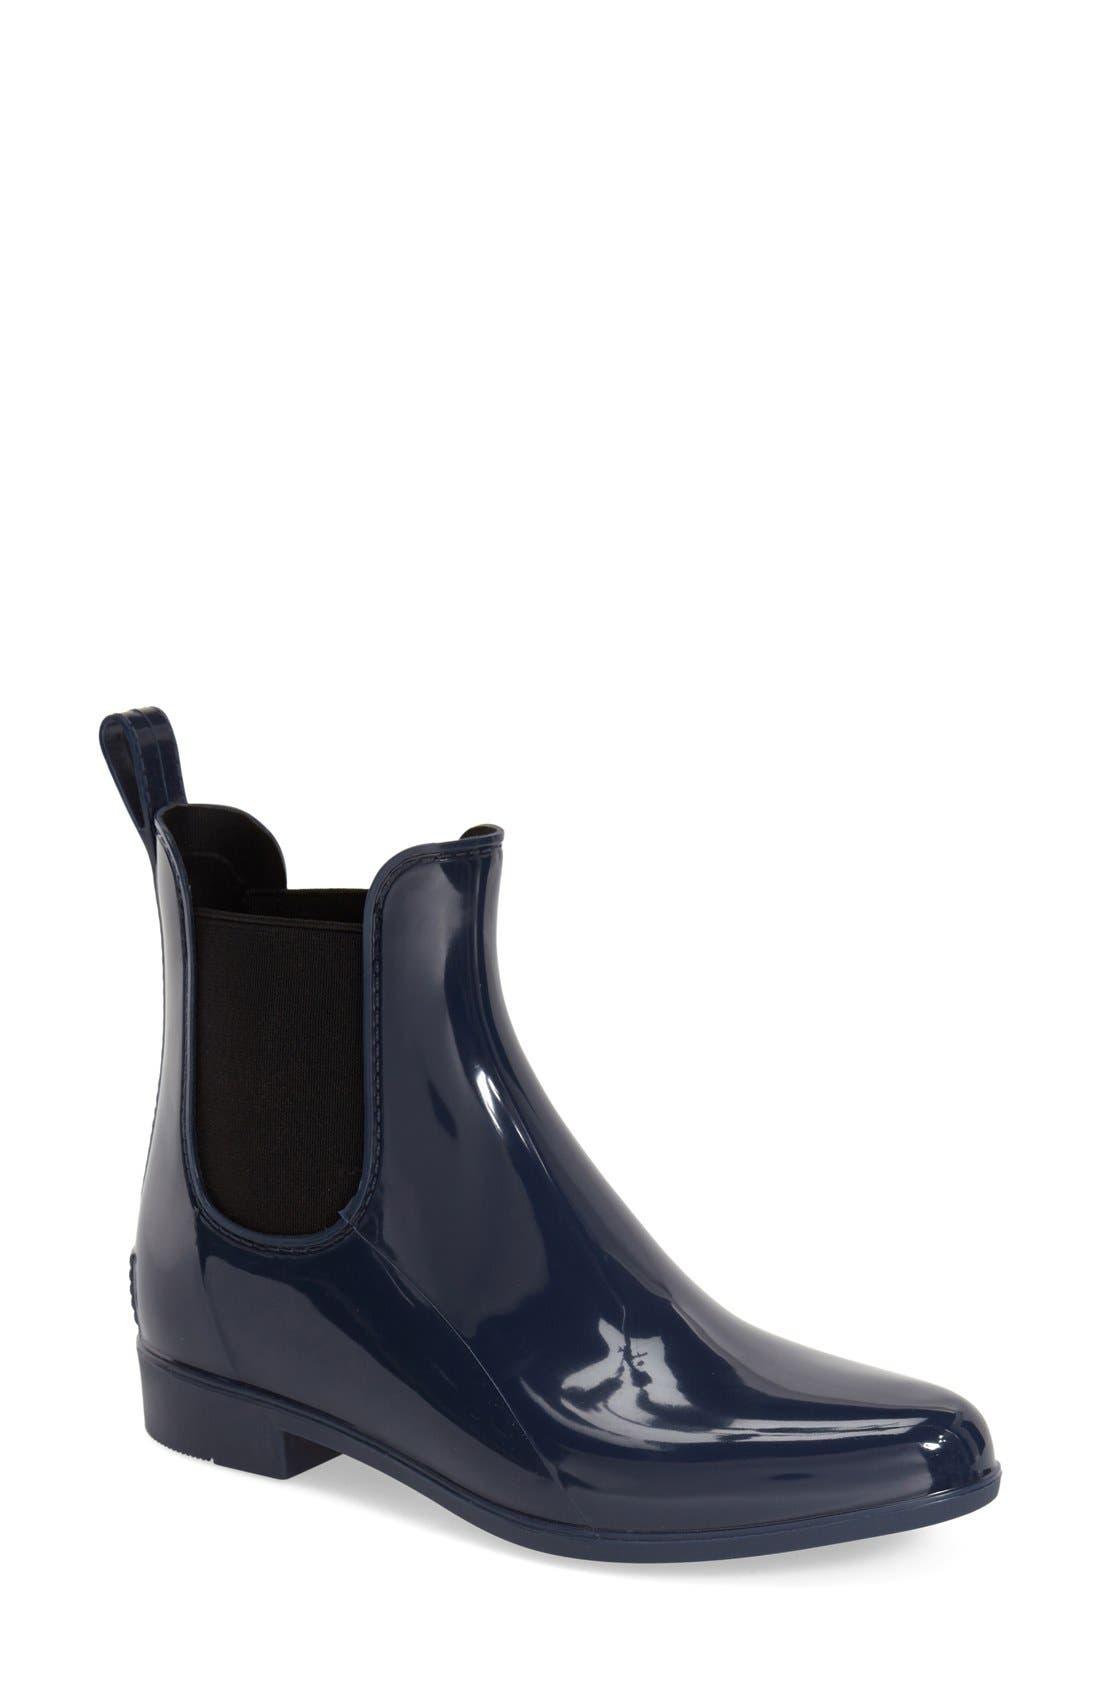 Main Image - Sam Edelman 'Tinsley' Rain Boot (Women)